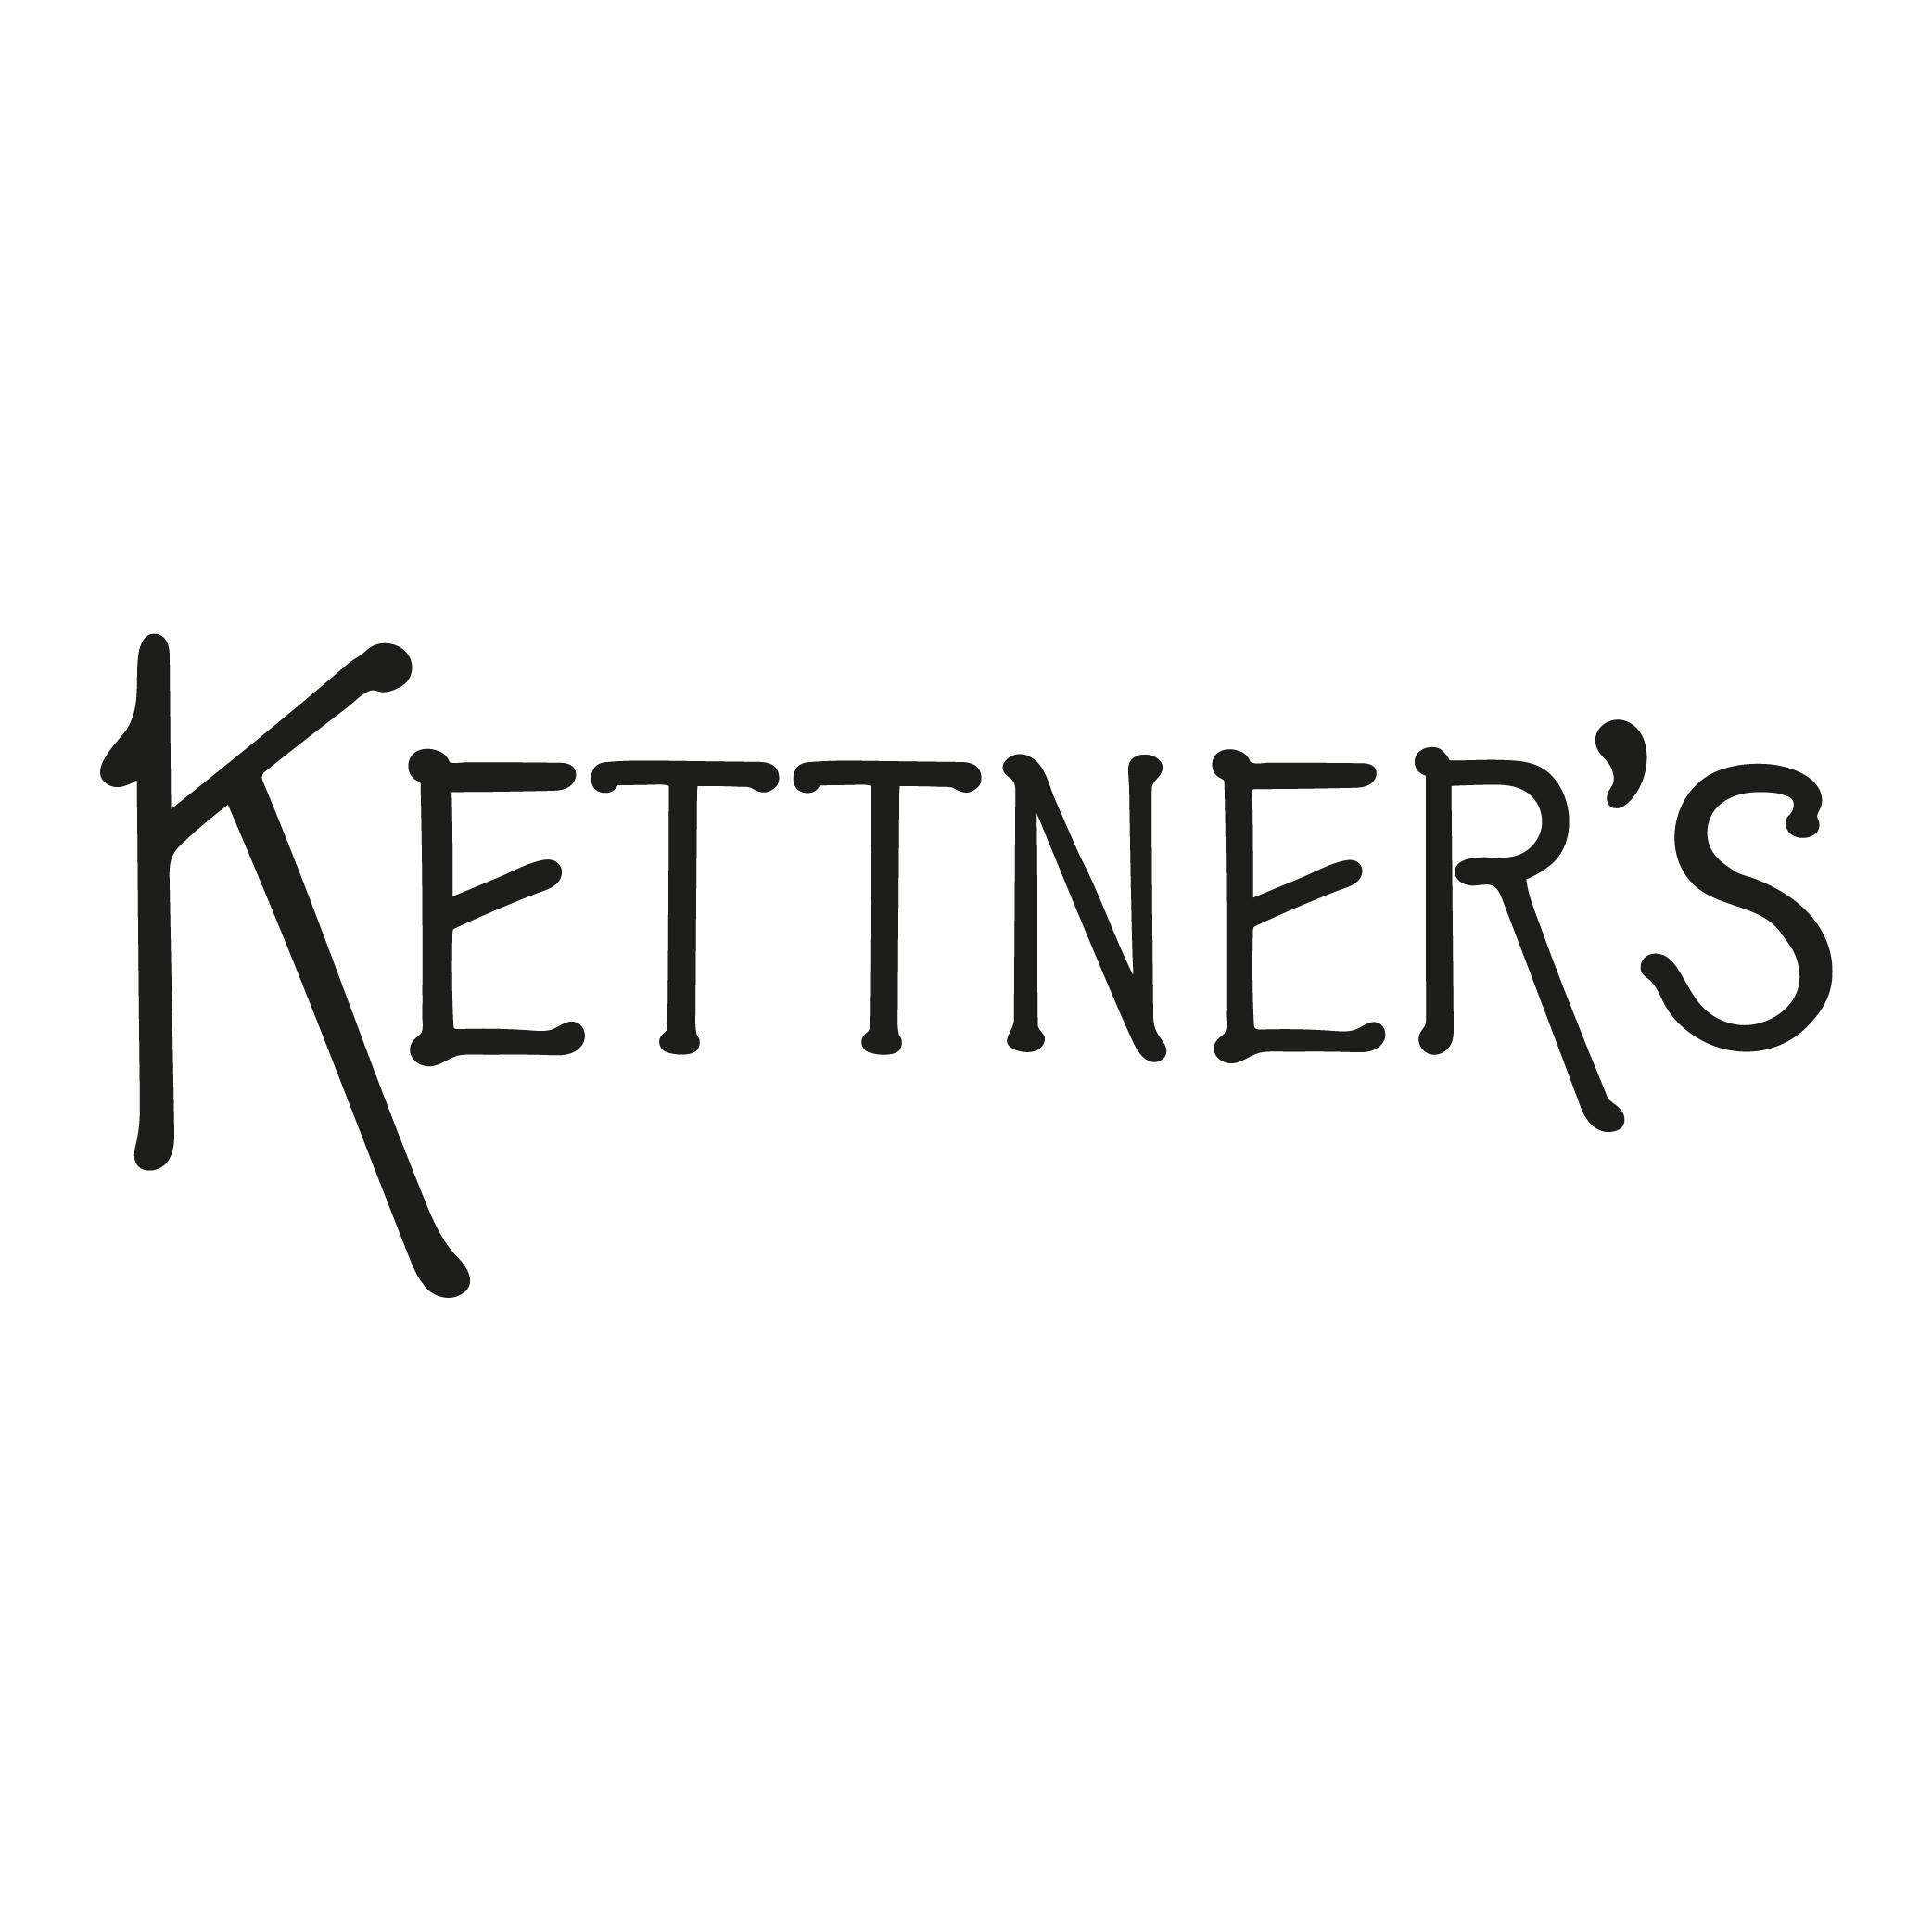 Kettner's - London, London W1D 5HP - 020 7734 5650 | ShowMeLocal.com